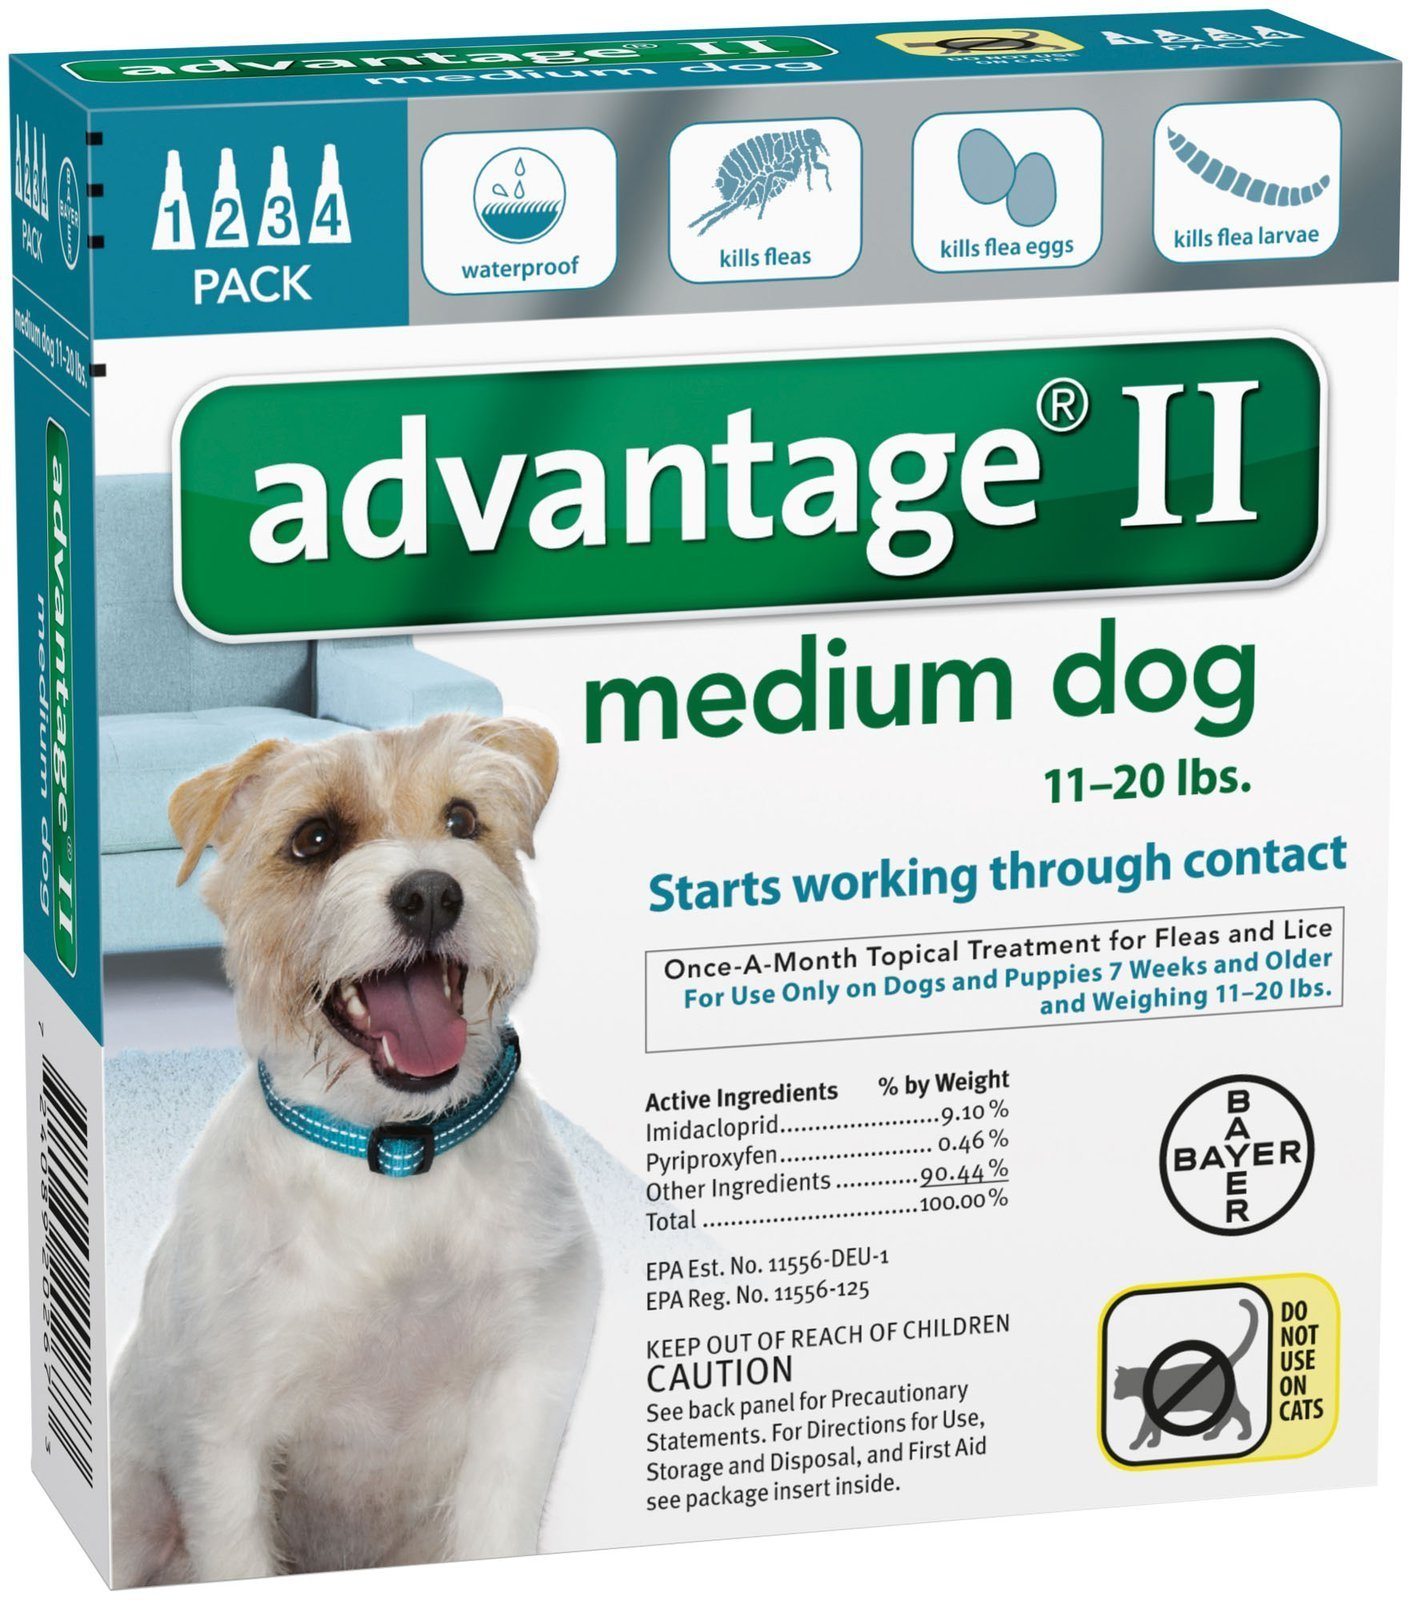 Bayer Animal Health Advantage II Medium Dog 4-Pack by Bayer Animal Health